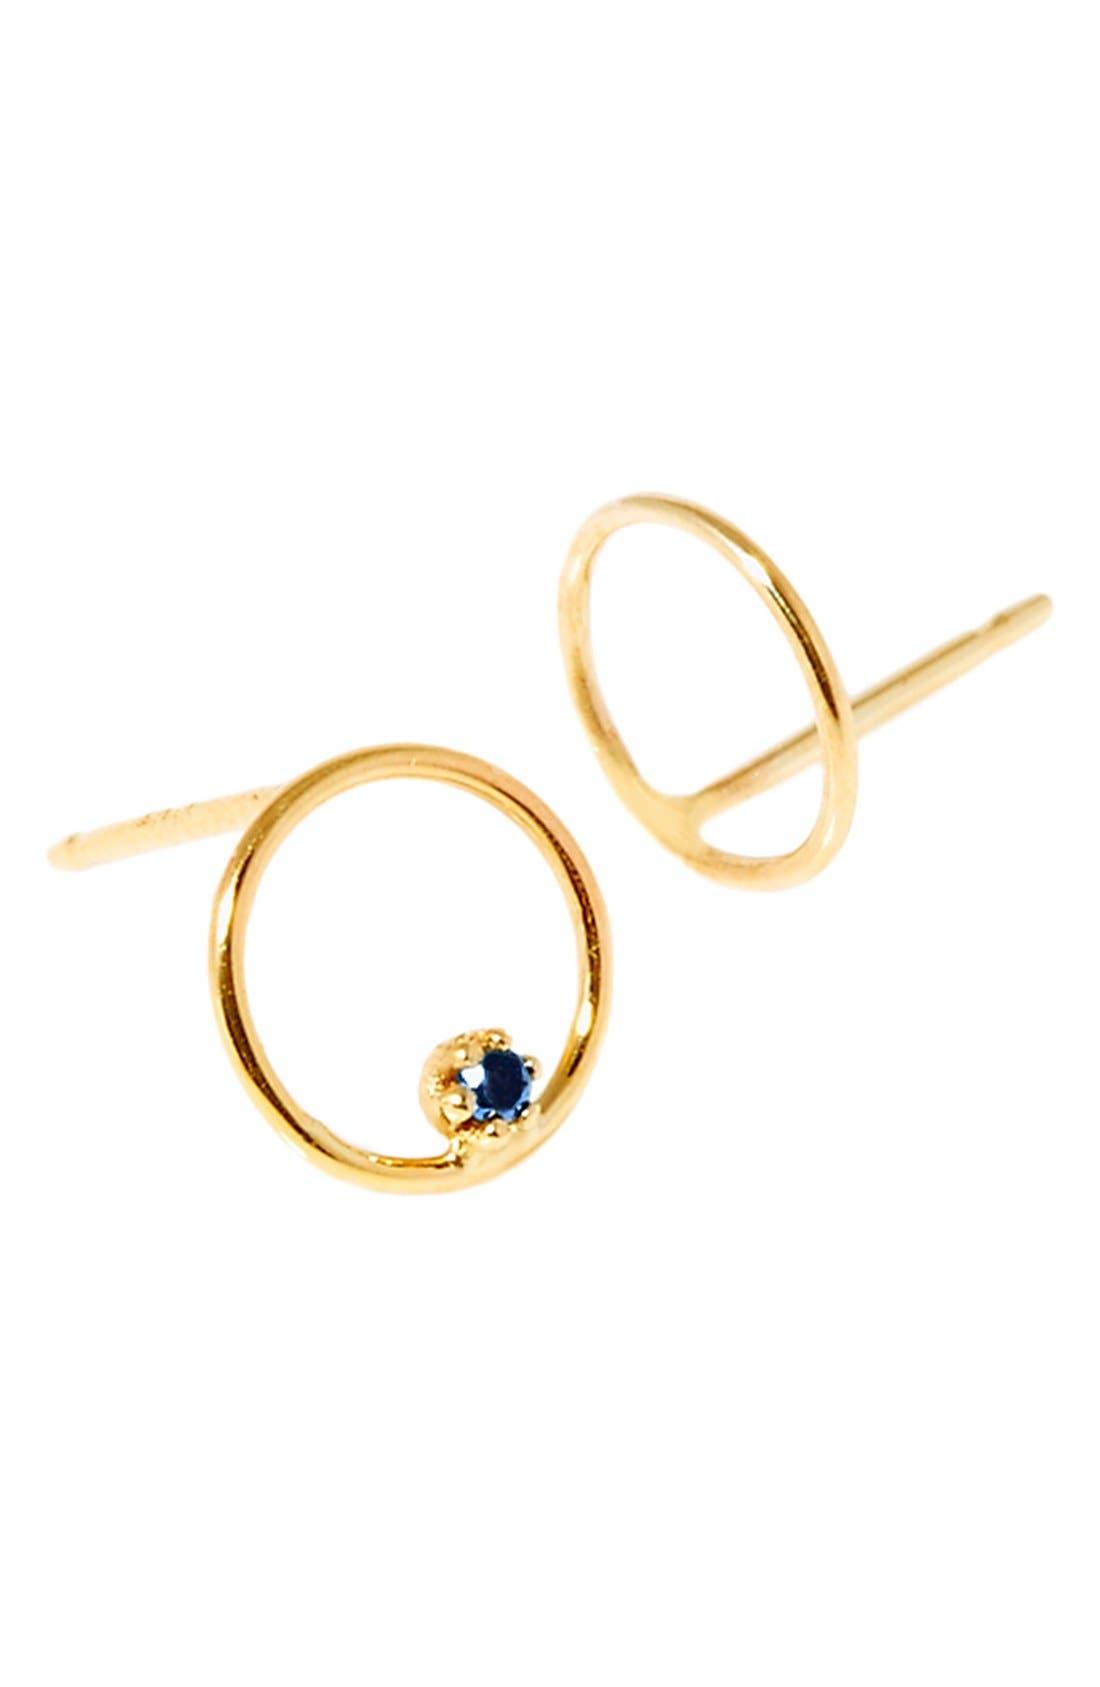 Main Image - SARAH & SEBASTIAN 'Stone Bubble' Mismatched Gold & Sapphire Earrings